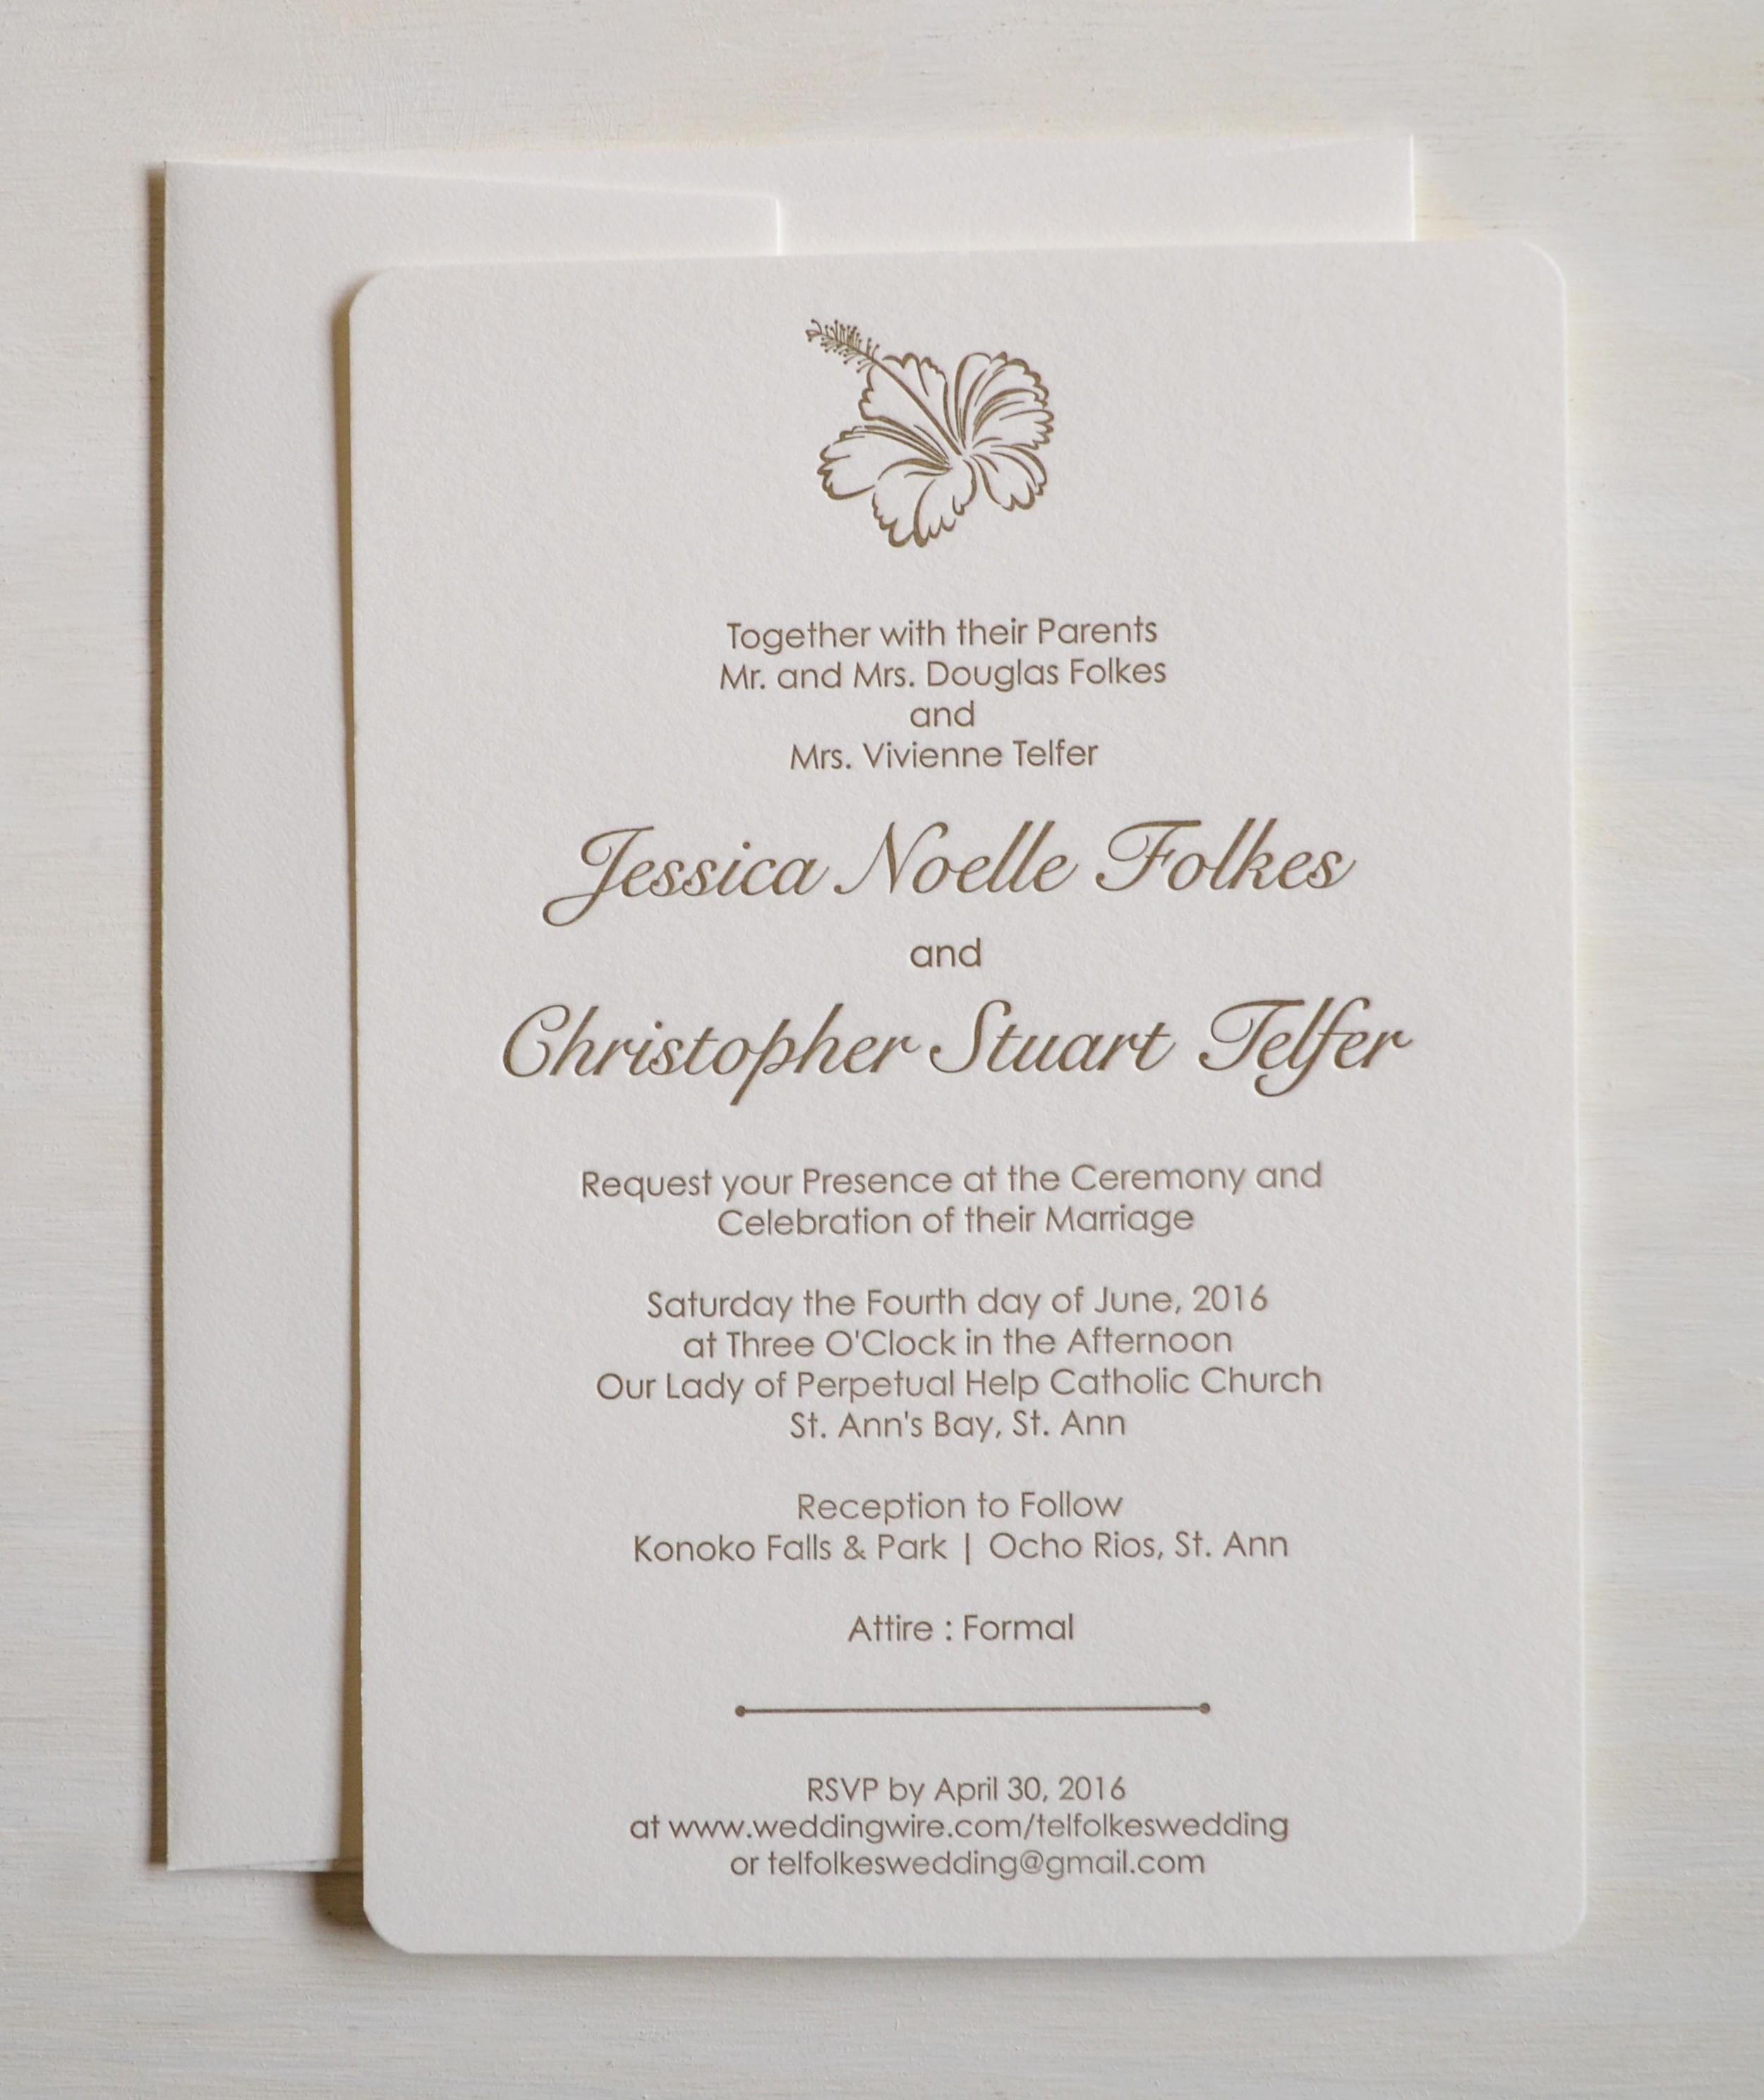 J&C Letterpress Wedding Invitation Hibiscus -1.jpg